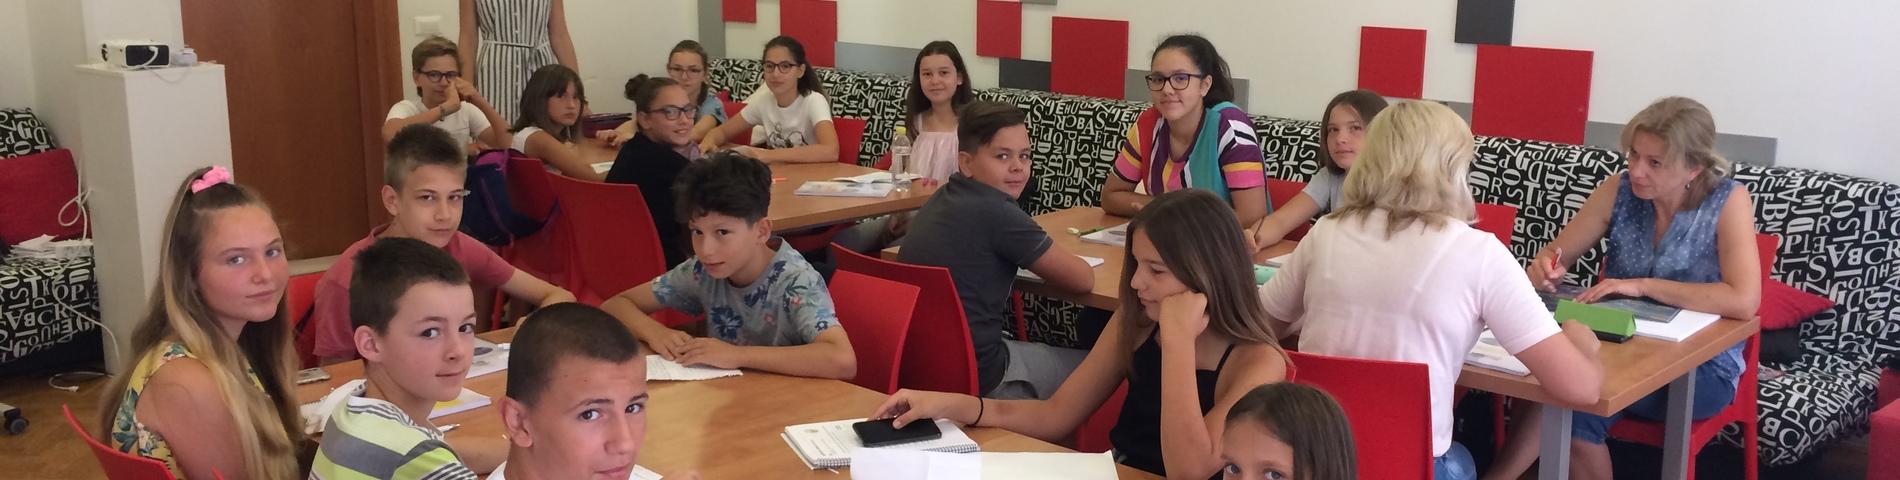 Dubrovnik Language School picture 1